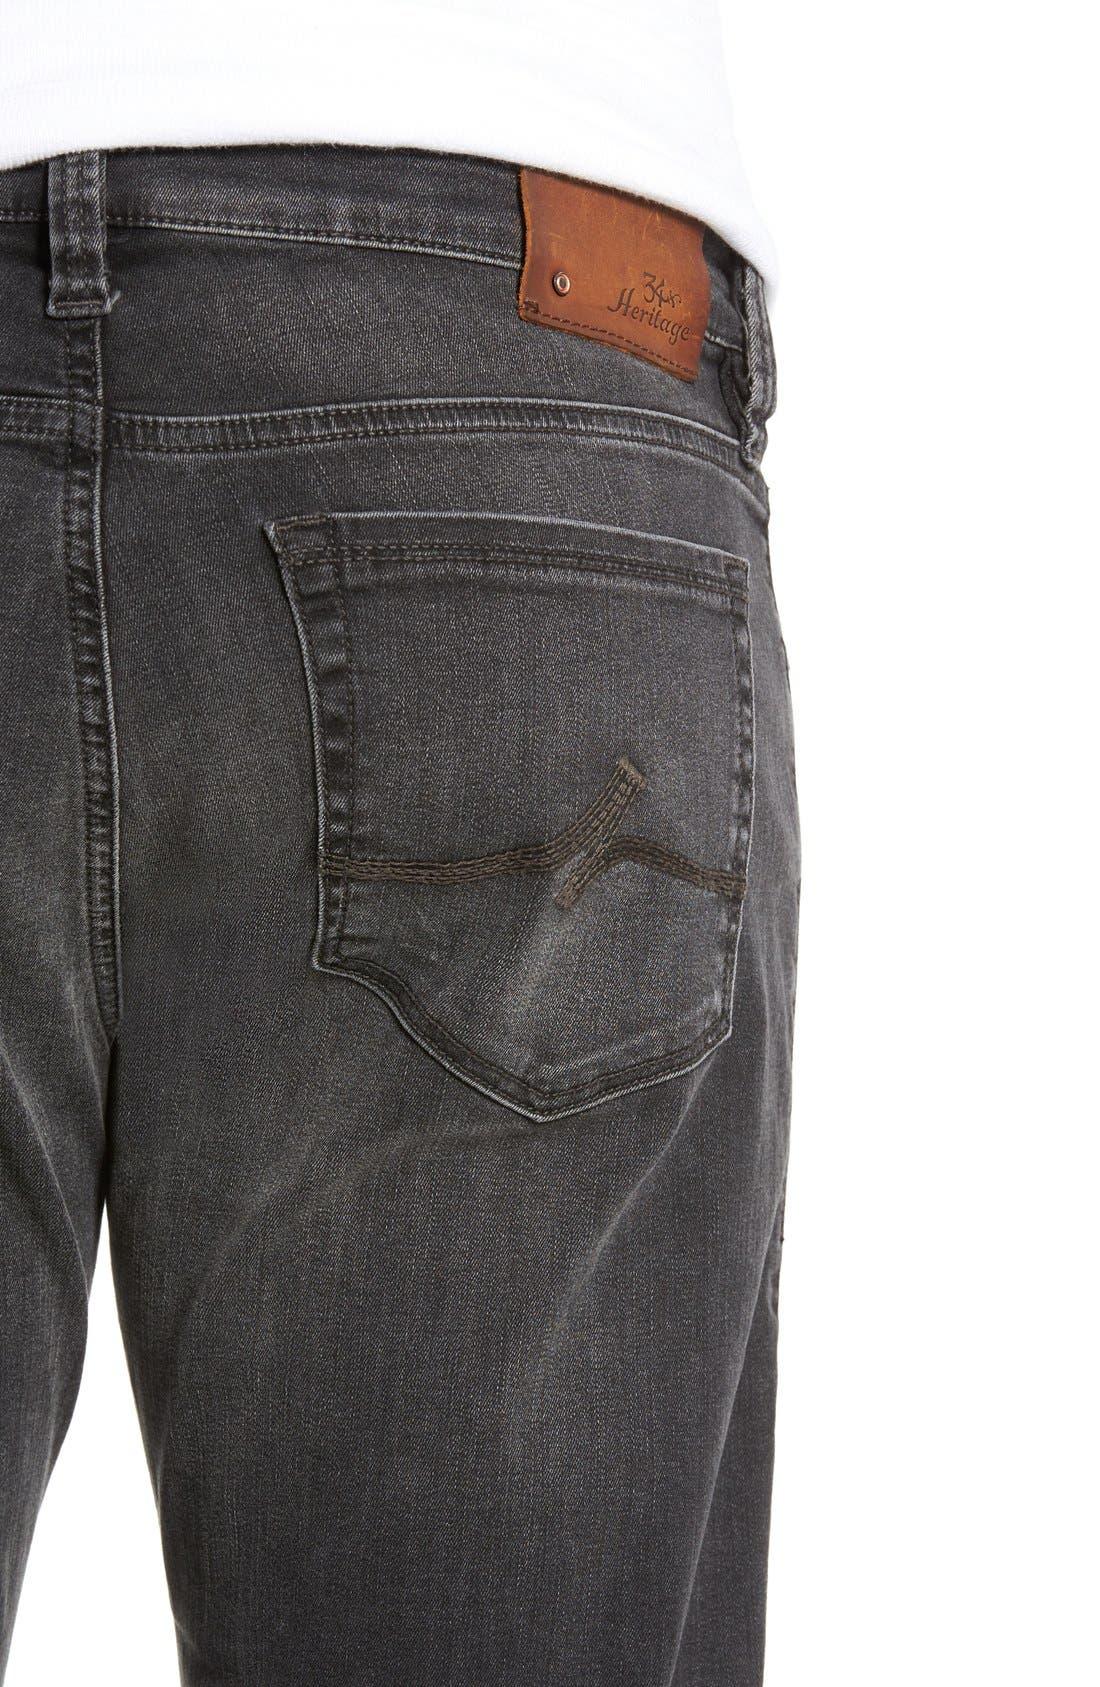 Alternate Image 4  - 34 Heritage 'Courage' Straight Leg Jeans (Coal Soft)